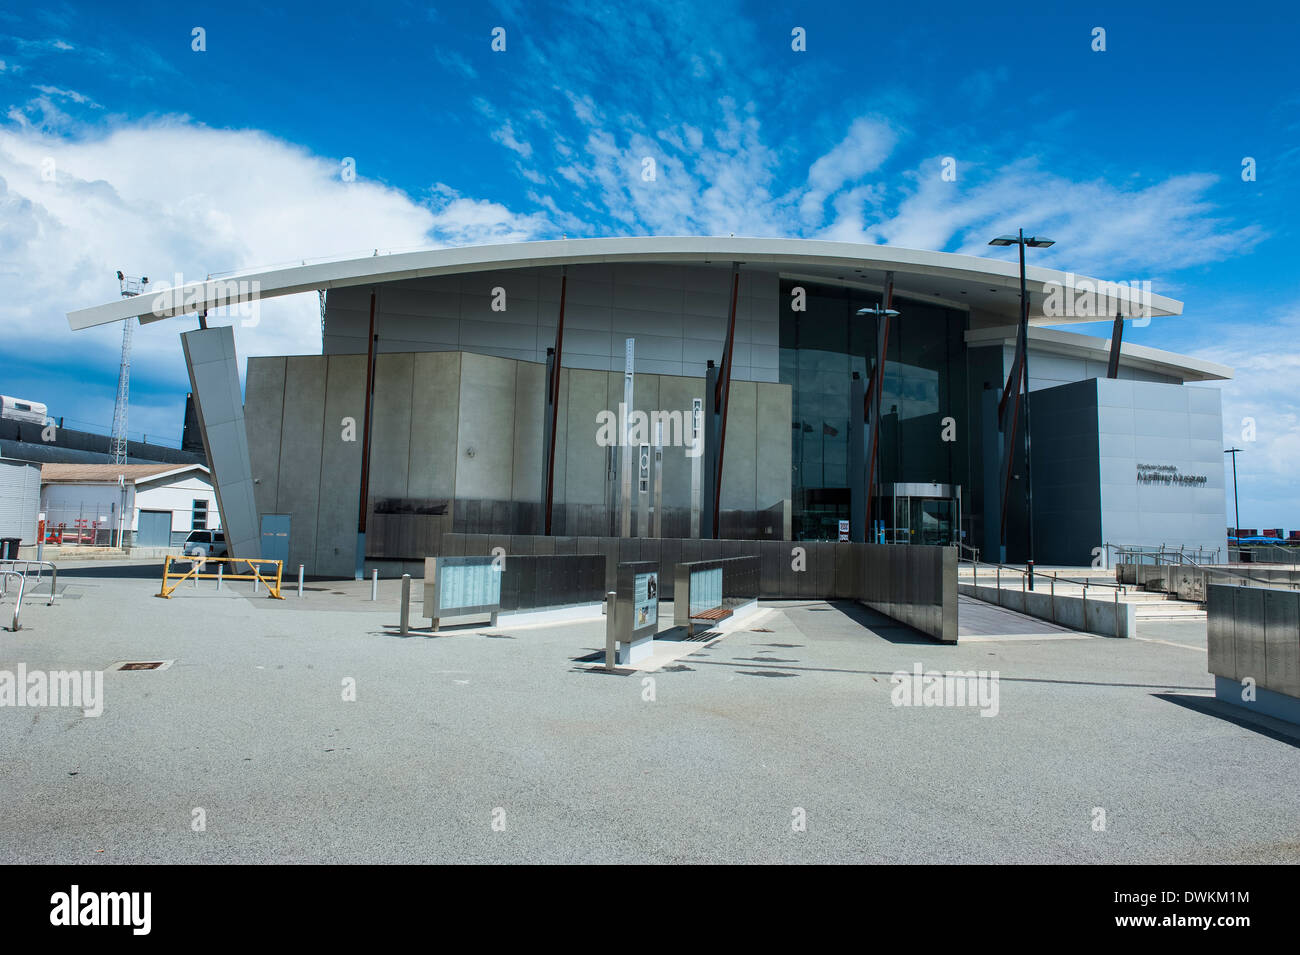 Western Australian Maritime Museum, Fremantle, Western Australia, Australia, Pacific - Stock Image